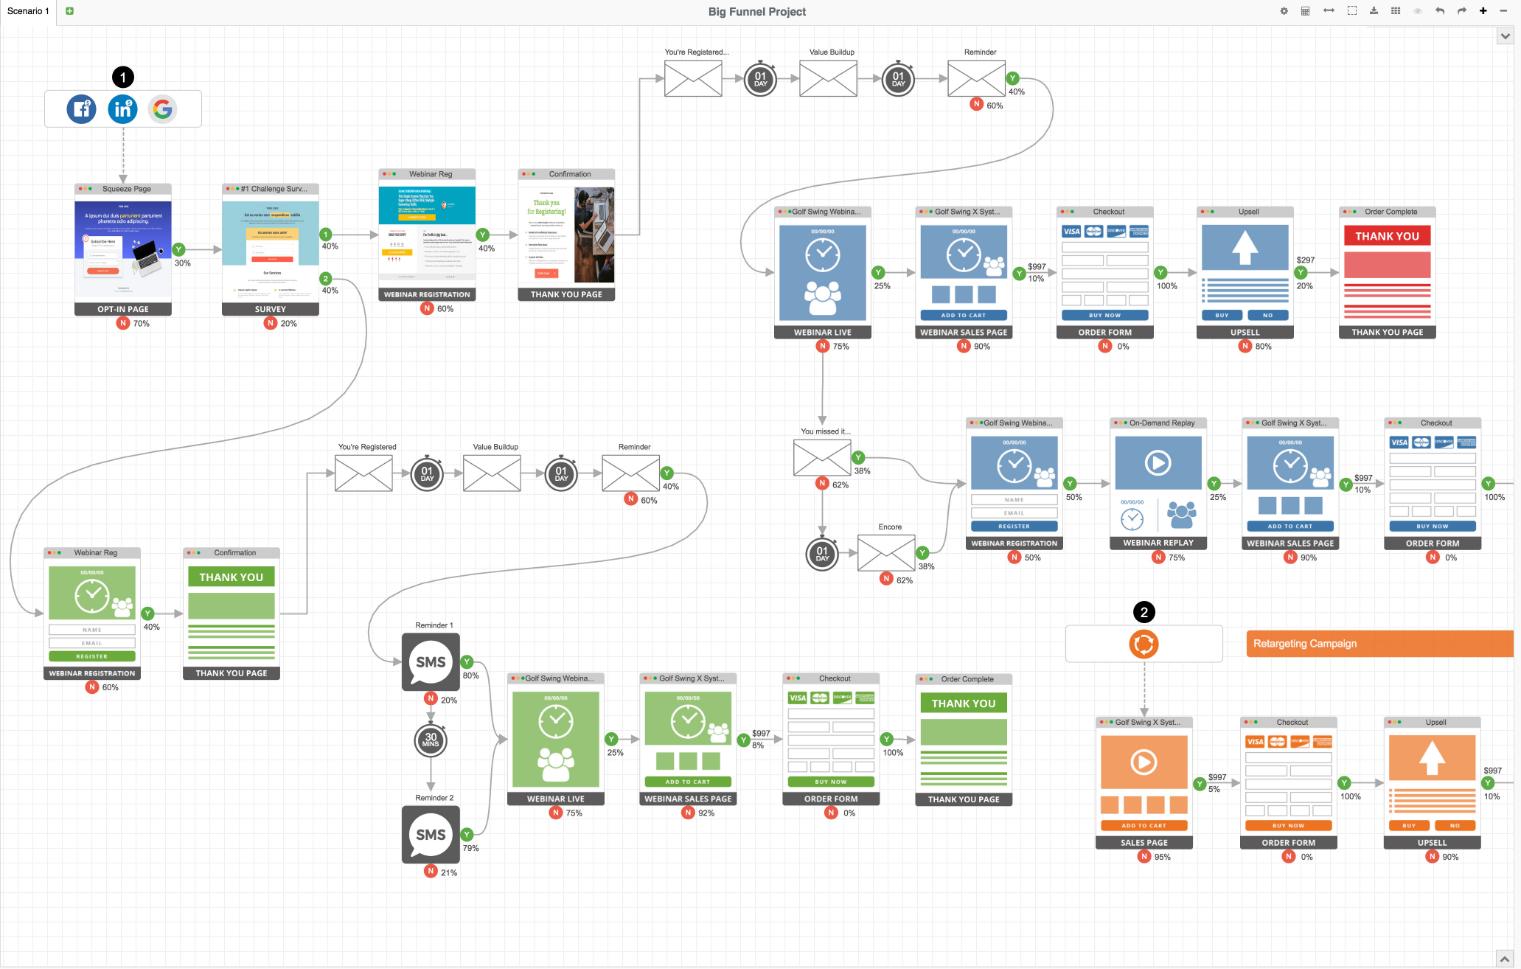 Digital Marketing Funnel Visual